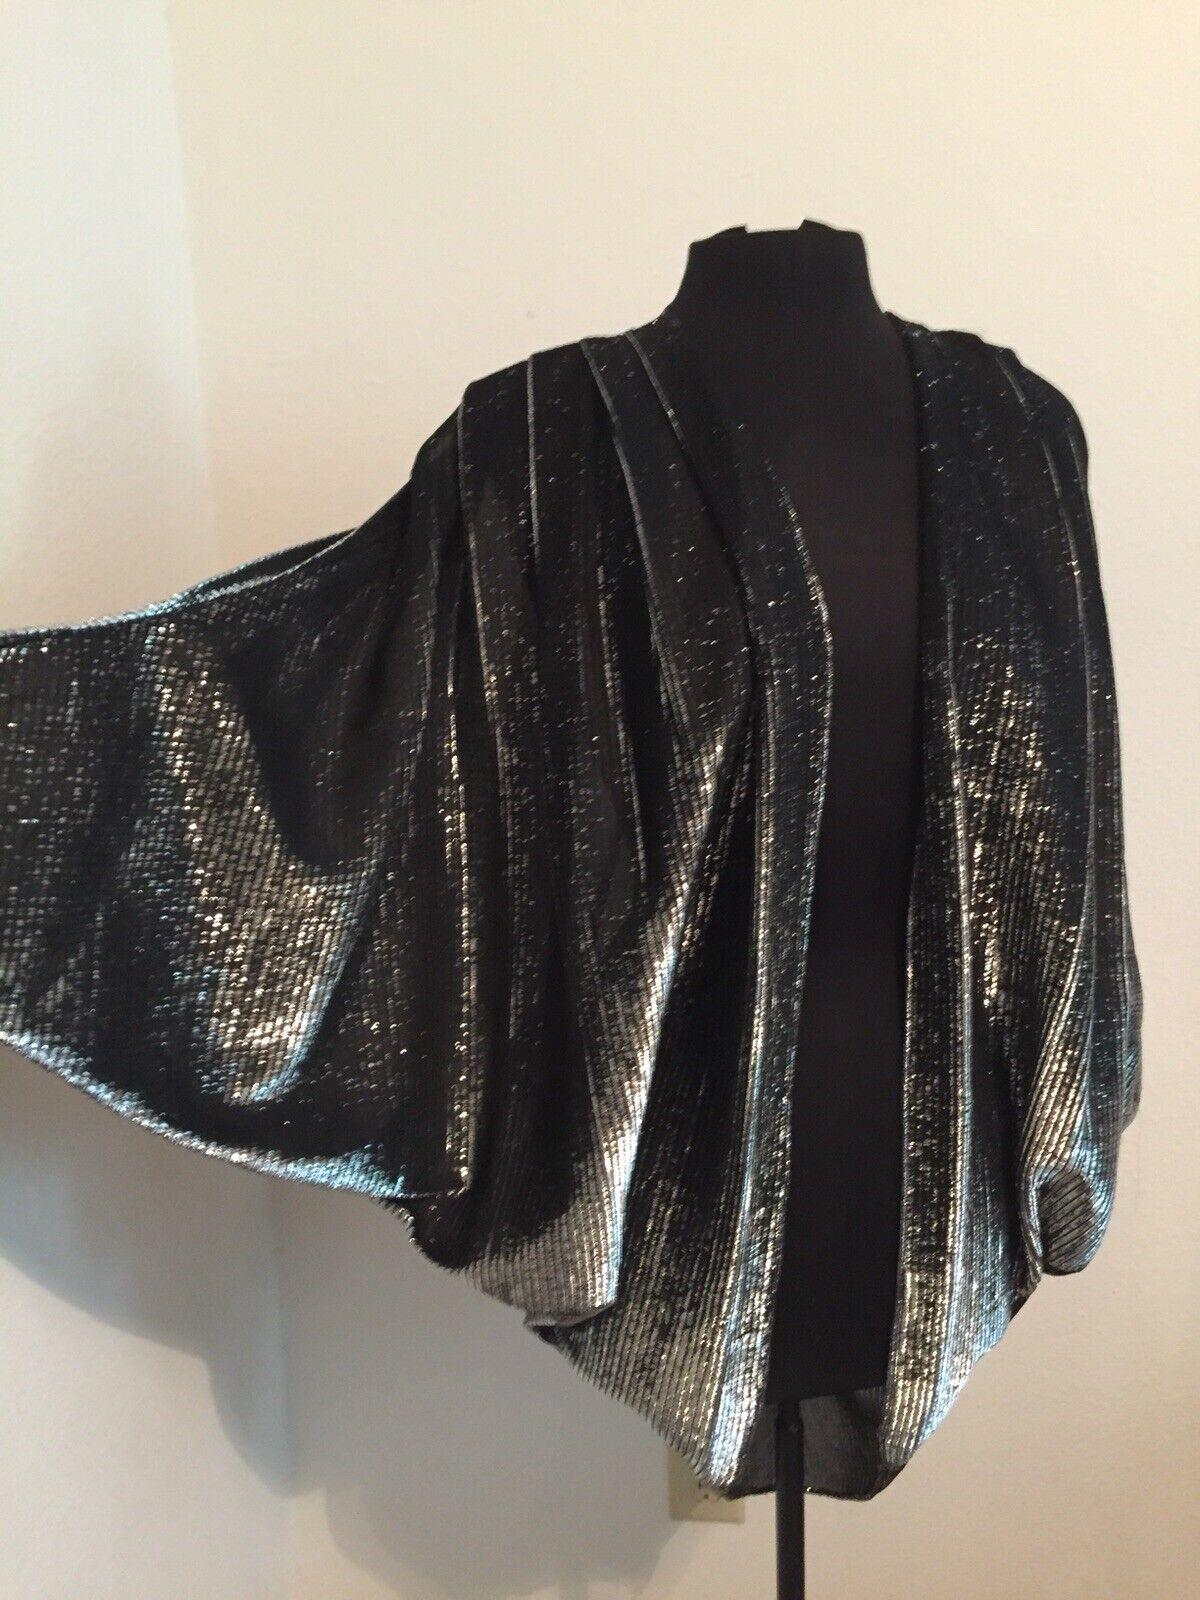 ❤️Vintage Metallic Disco Batwing Cocoon Rocker Jacket Dolman Cape